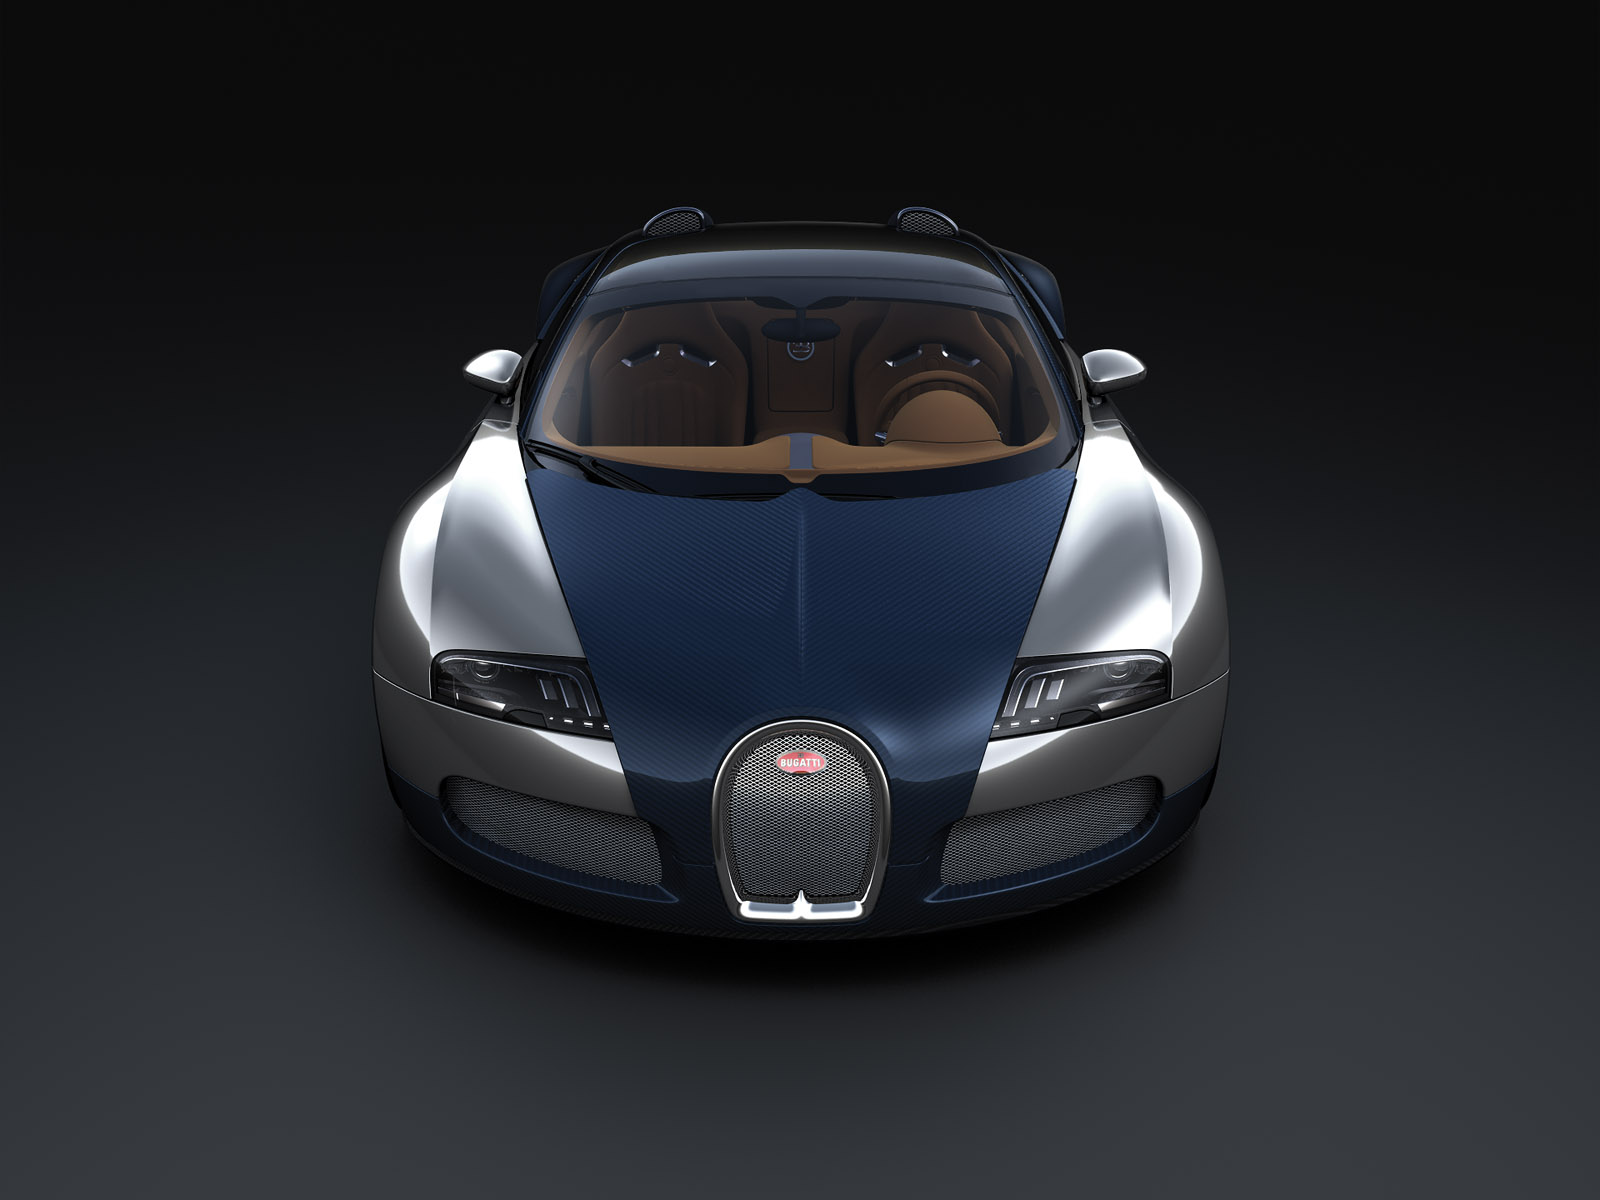 bugatti-sang-bleu-06 Gorgeous Bugatti Veyron Grand Sport Vitesse Bleu Cars Trend